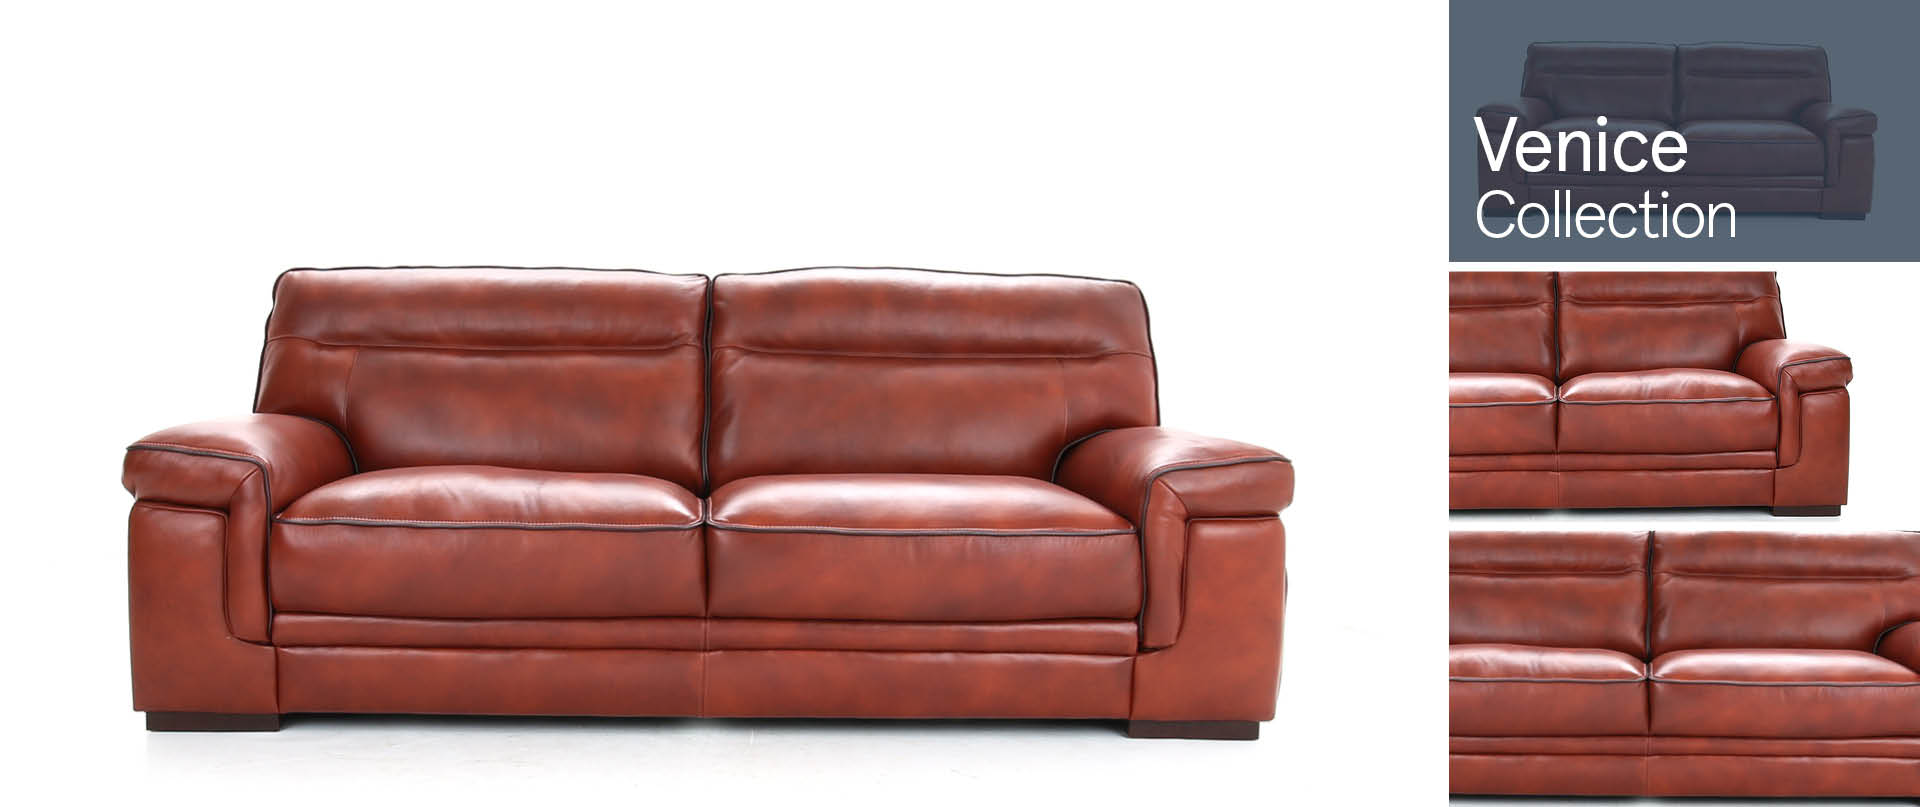 Venice Leather Sofa Ranges